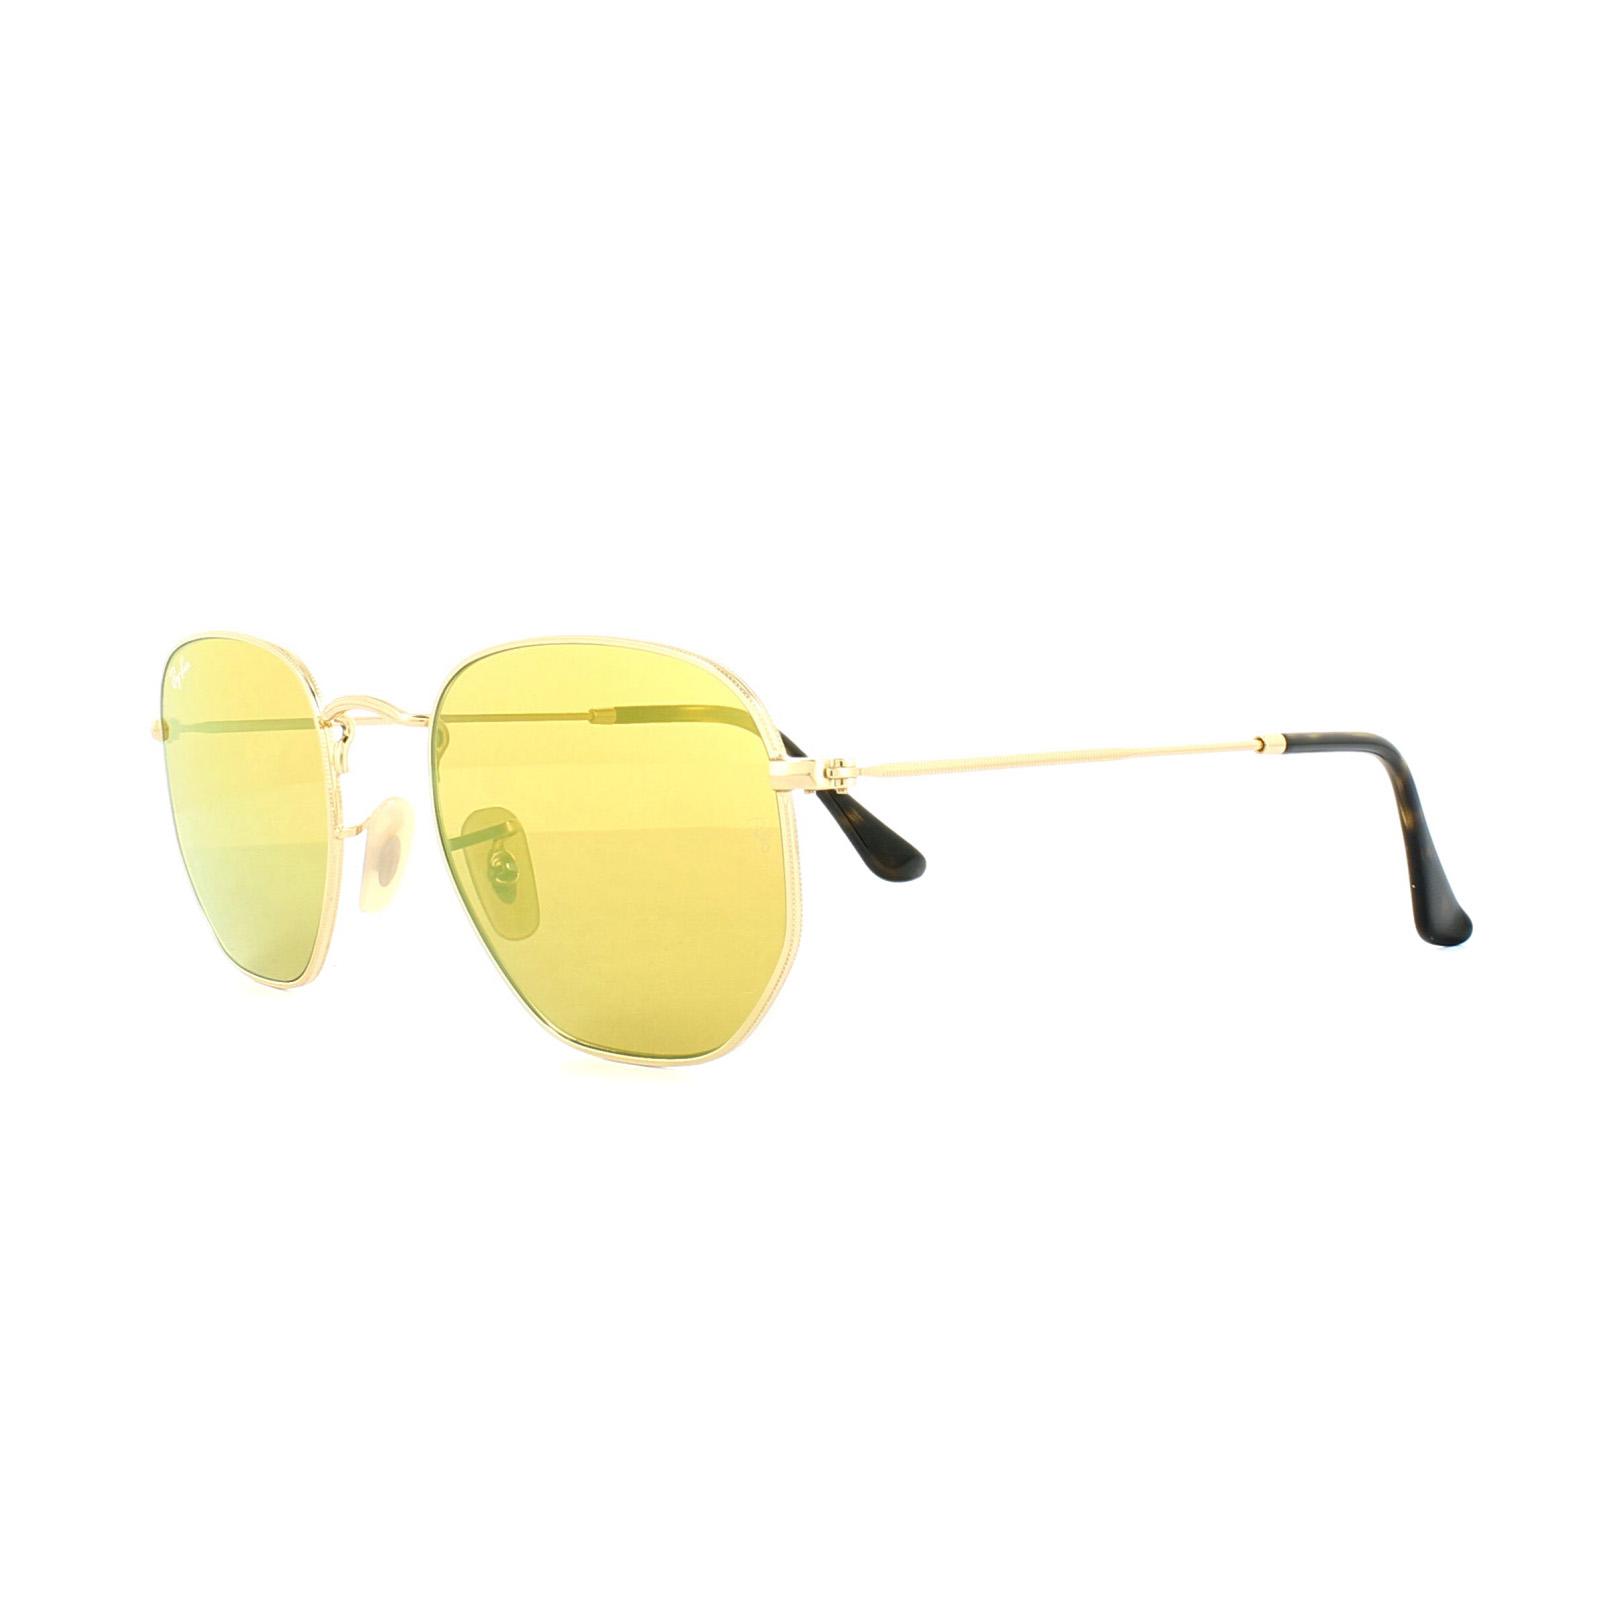 Sentinel Ray-Ban Sunglasses Hexagonal 3548N 001 93 Gold Yellow Mirror 9d4f80331e